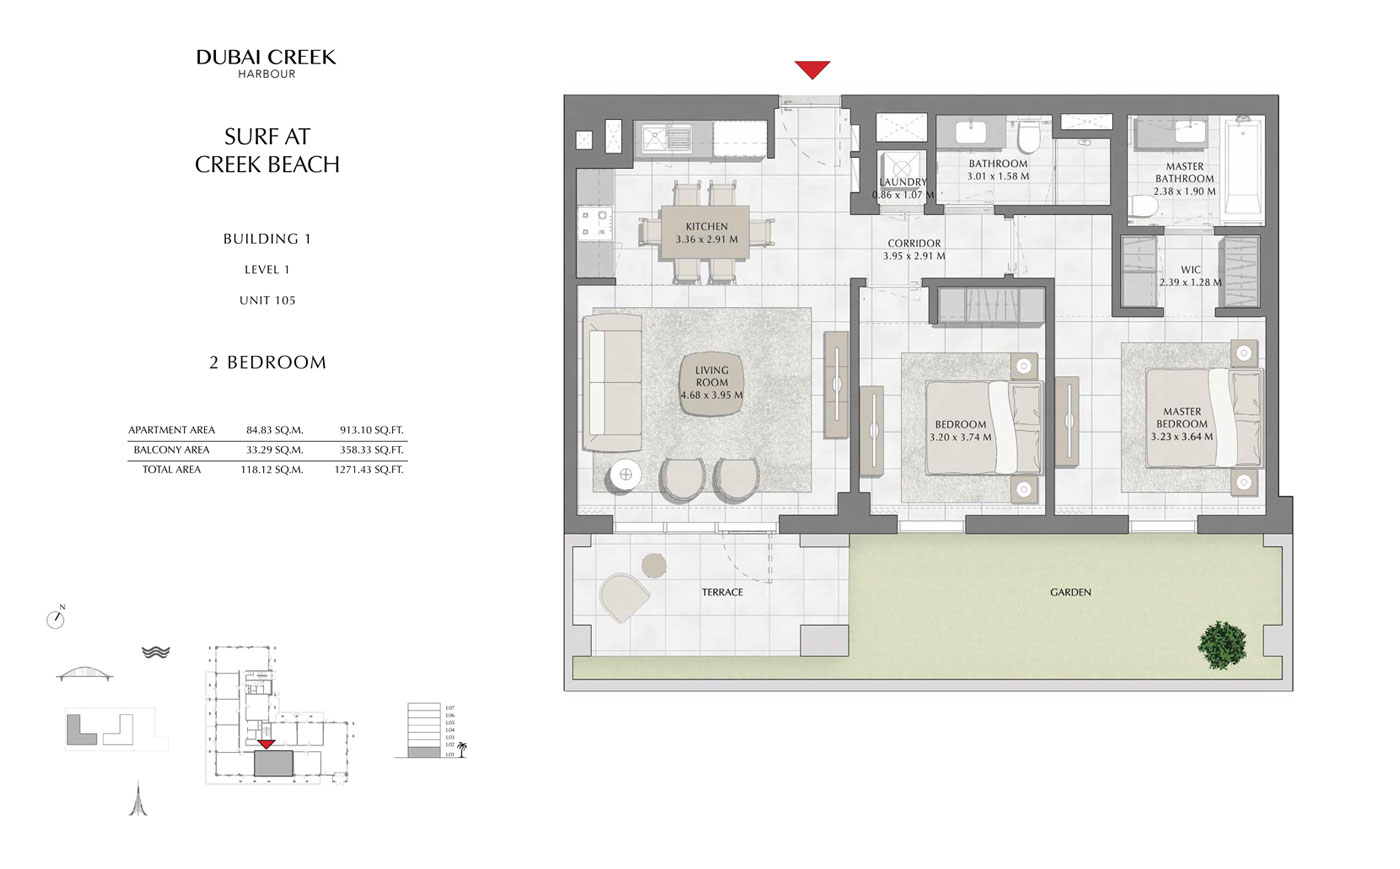 Building-1-2-Bedroom,-Level-1,-Unit-105,-Size-1271.43-sq-ft